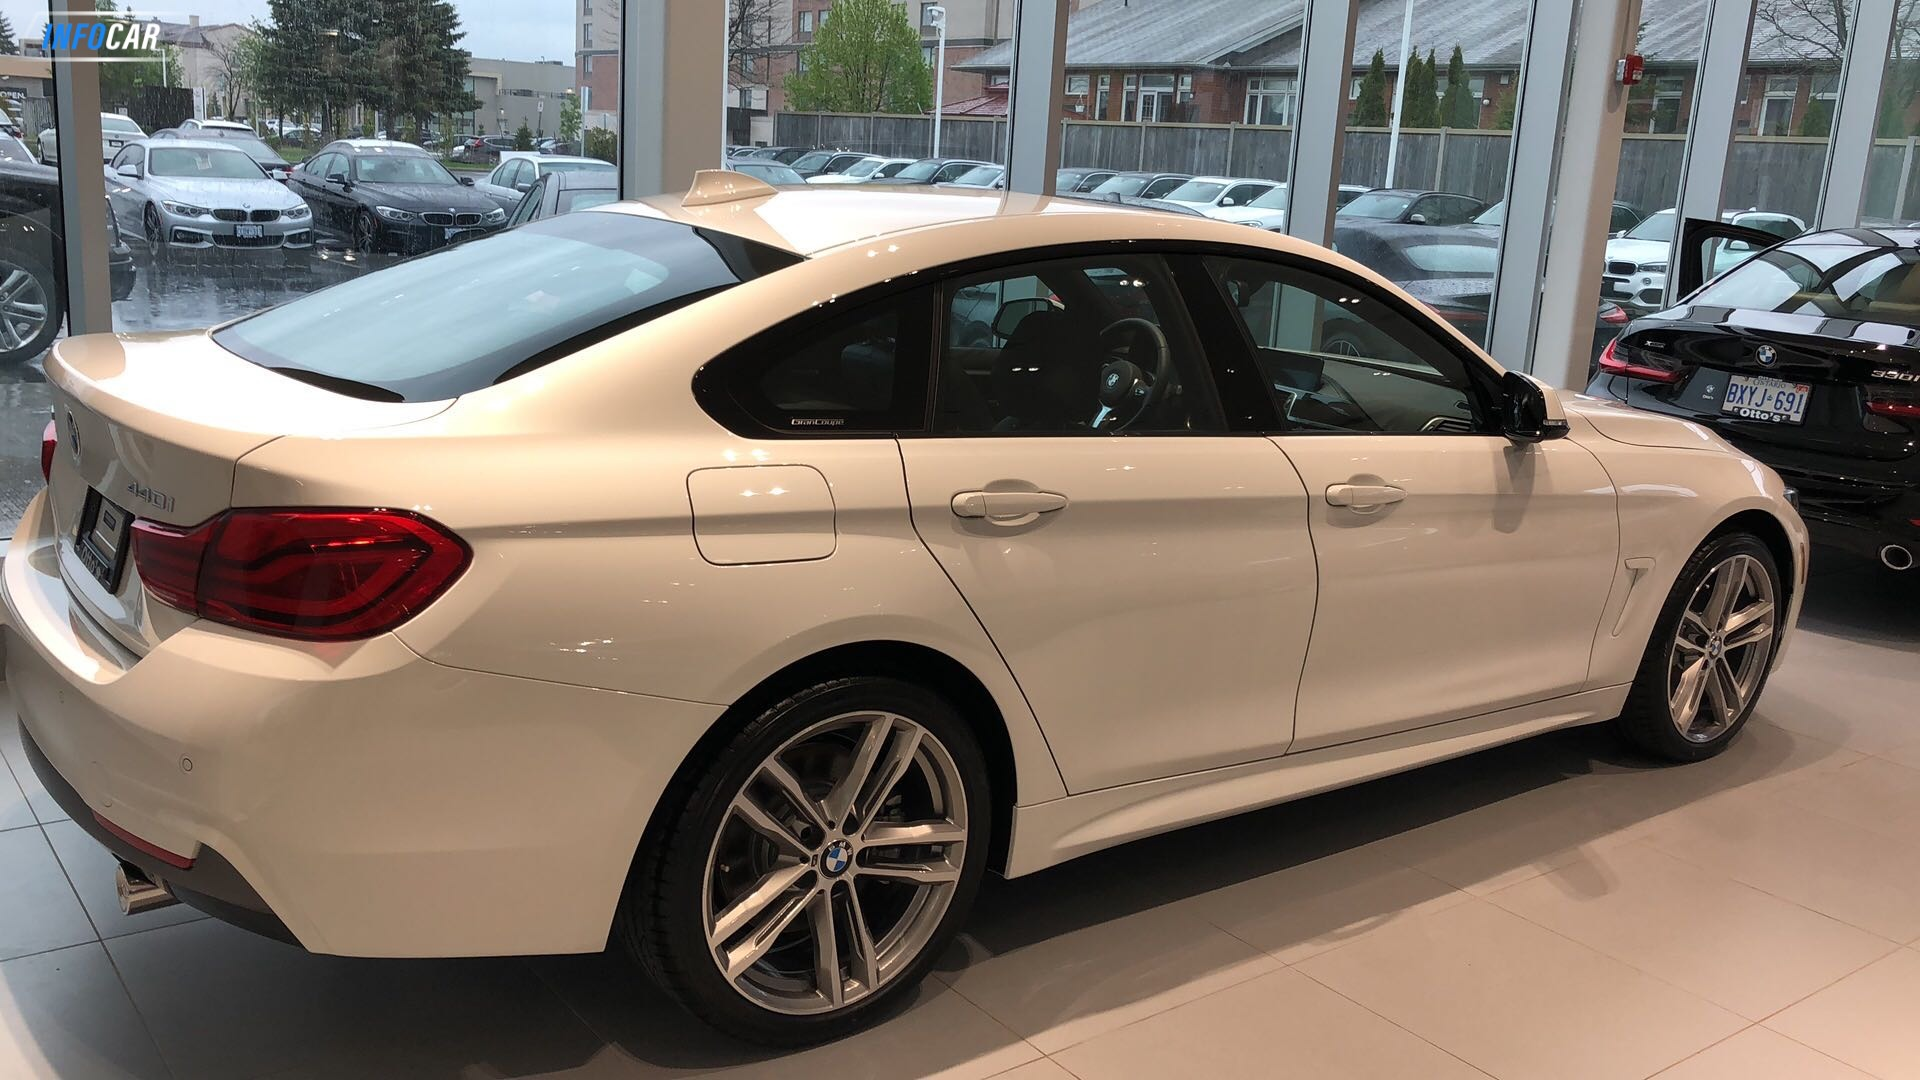 2019 BMW 4-Series 440i - INFOCAR - Toronto's Most Comprehensive New and Used Auto Trading Platform